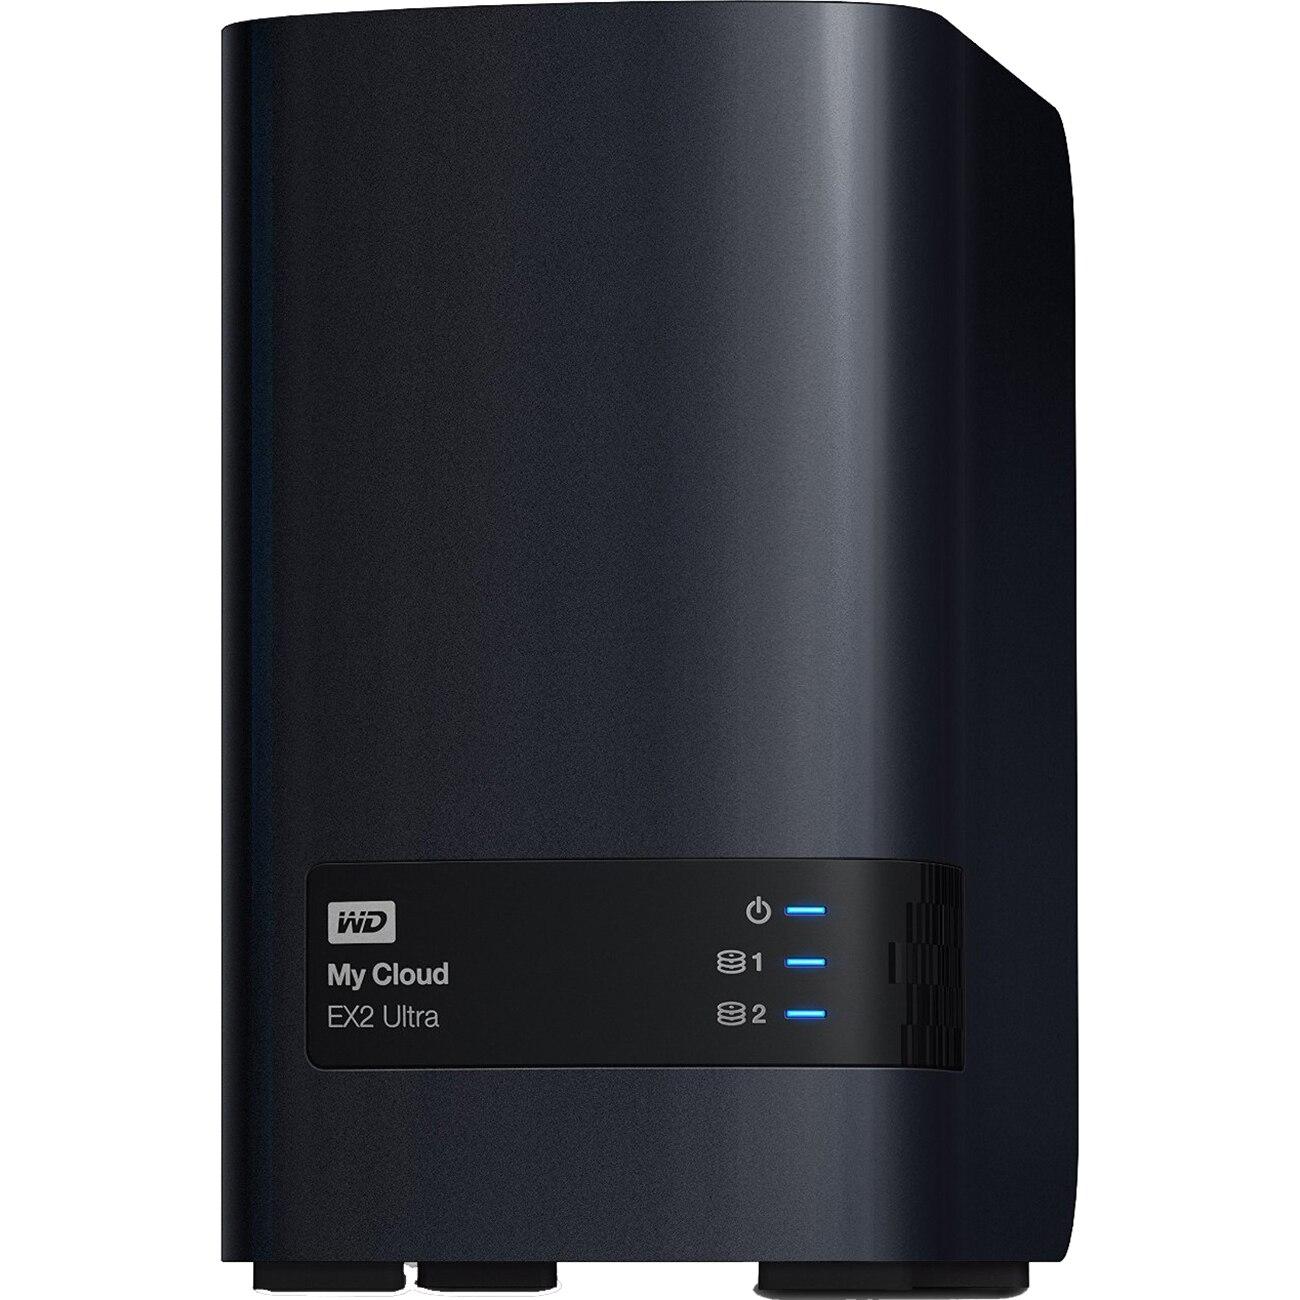 Fotografie Network Storage WD My Cloud Expert Series EX2 Ultra 16TB, Gigabit Ethernet, USB 3.0